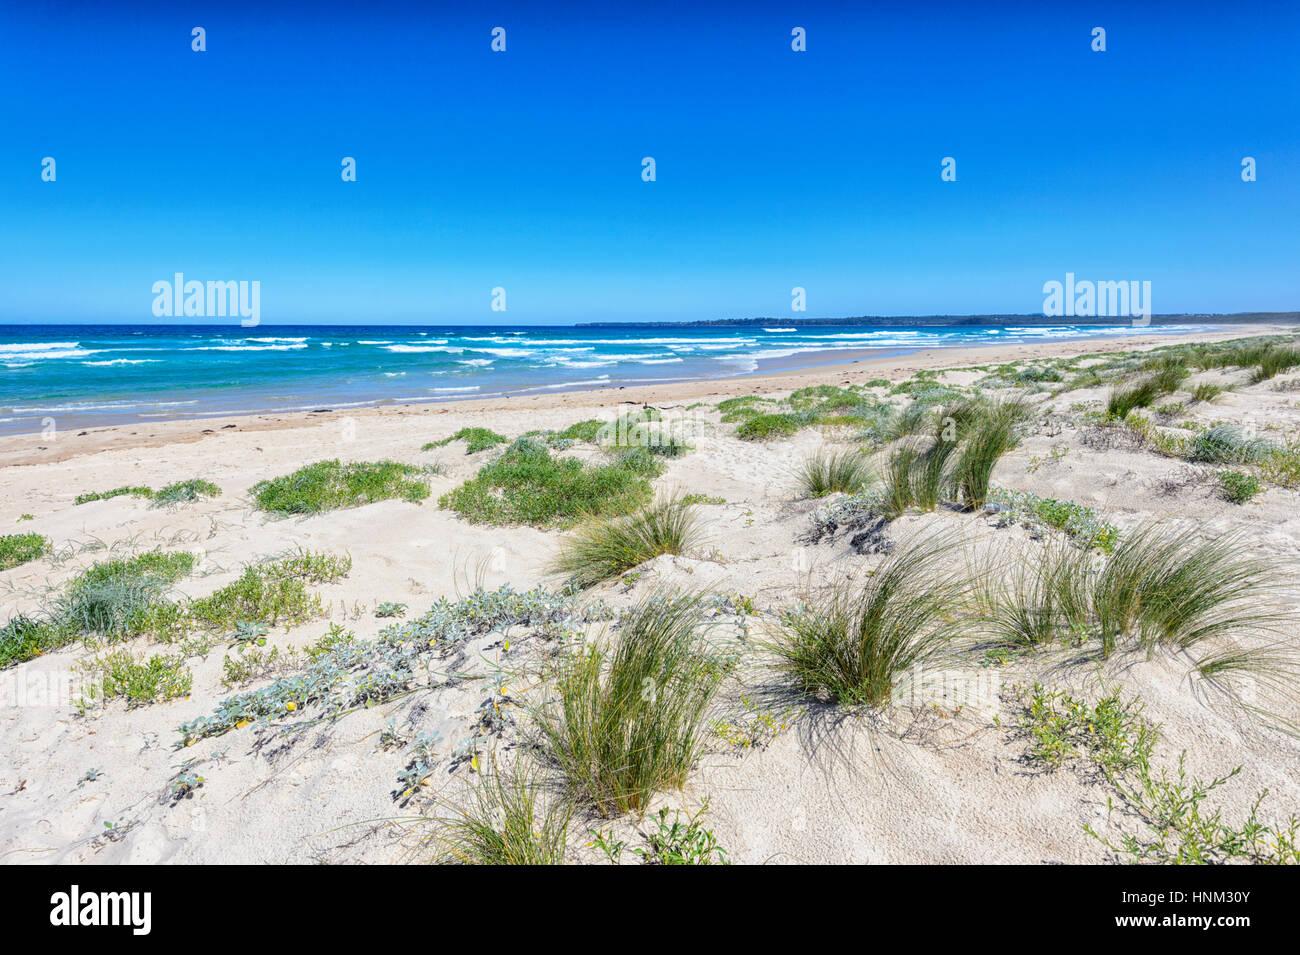 Sandstrand am Lake Conjola, Shoalhaven, South Coast, New-South.Wales, NSW, Australien Stockbild